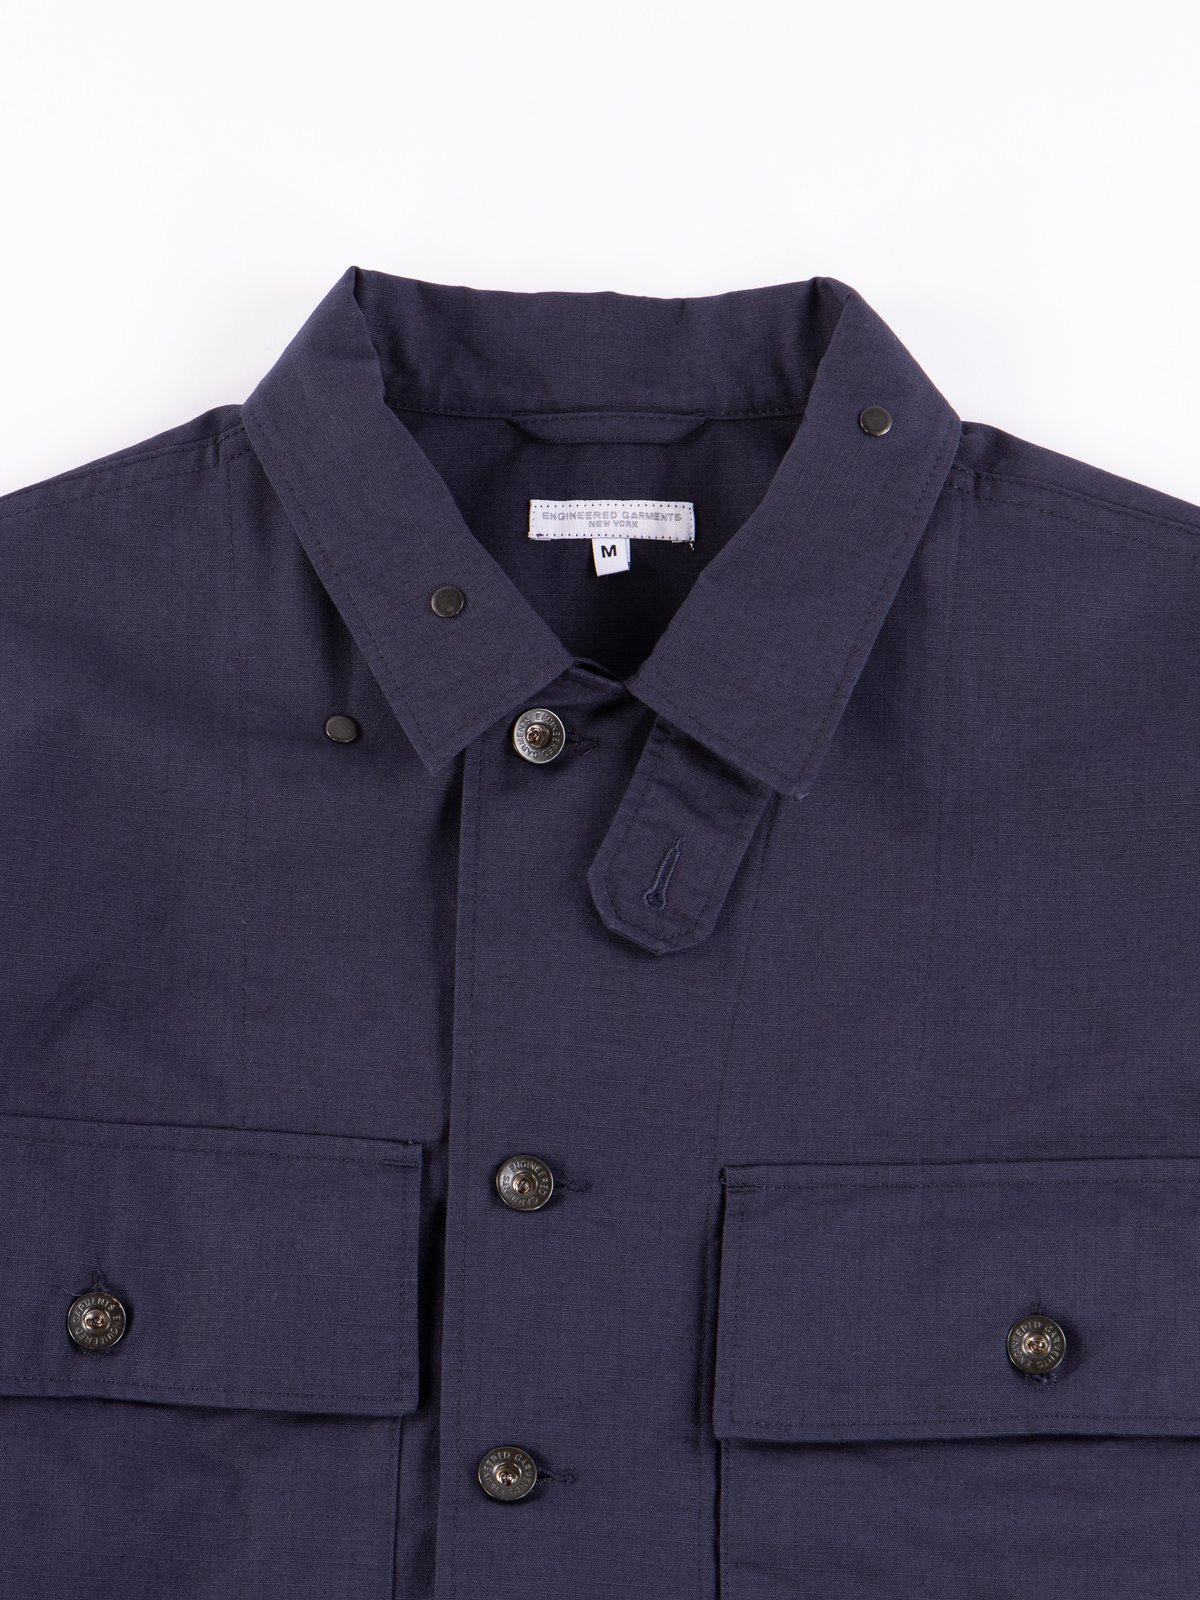 Dark Navy Cotton Ripstop M43/2 Shirt Jacket - Image 4